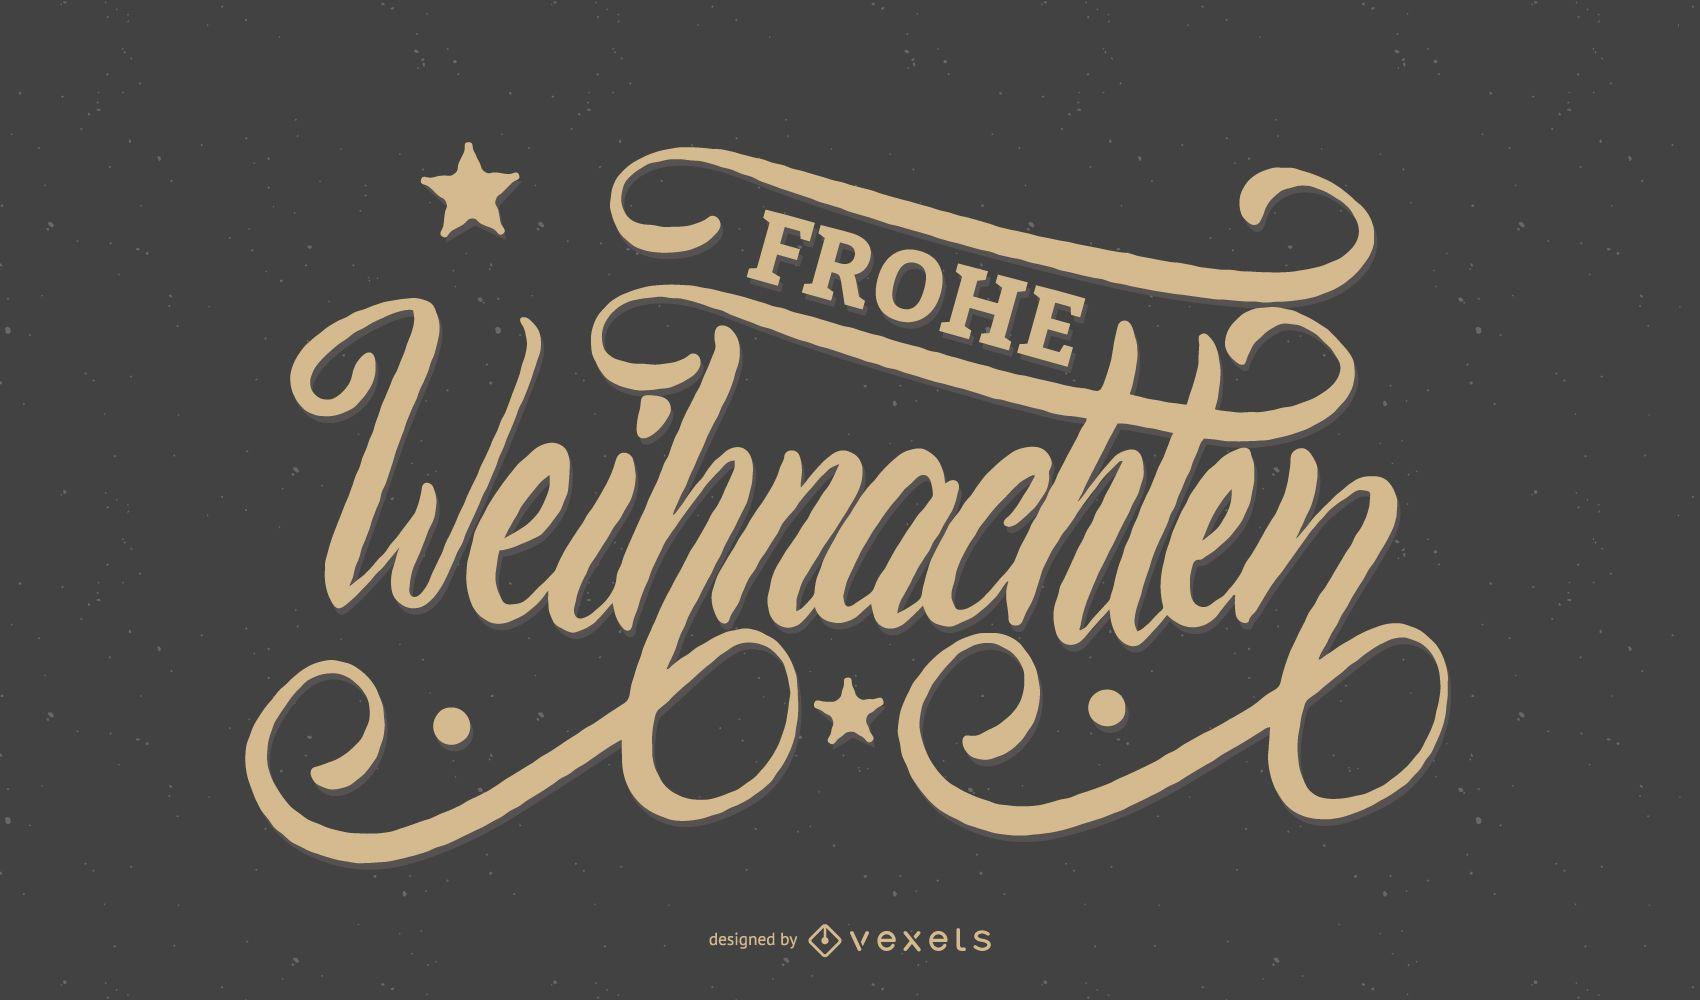 Banner de Navidad de escritura a mano Frohe Weihnachten